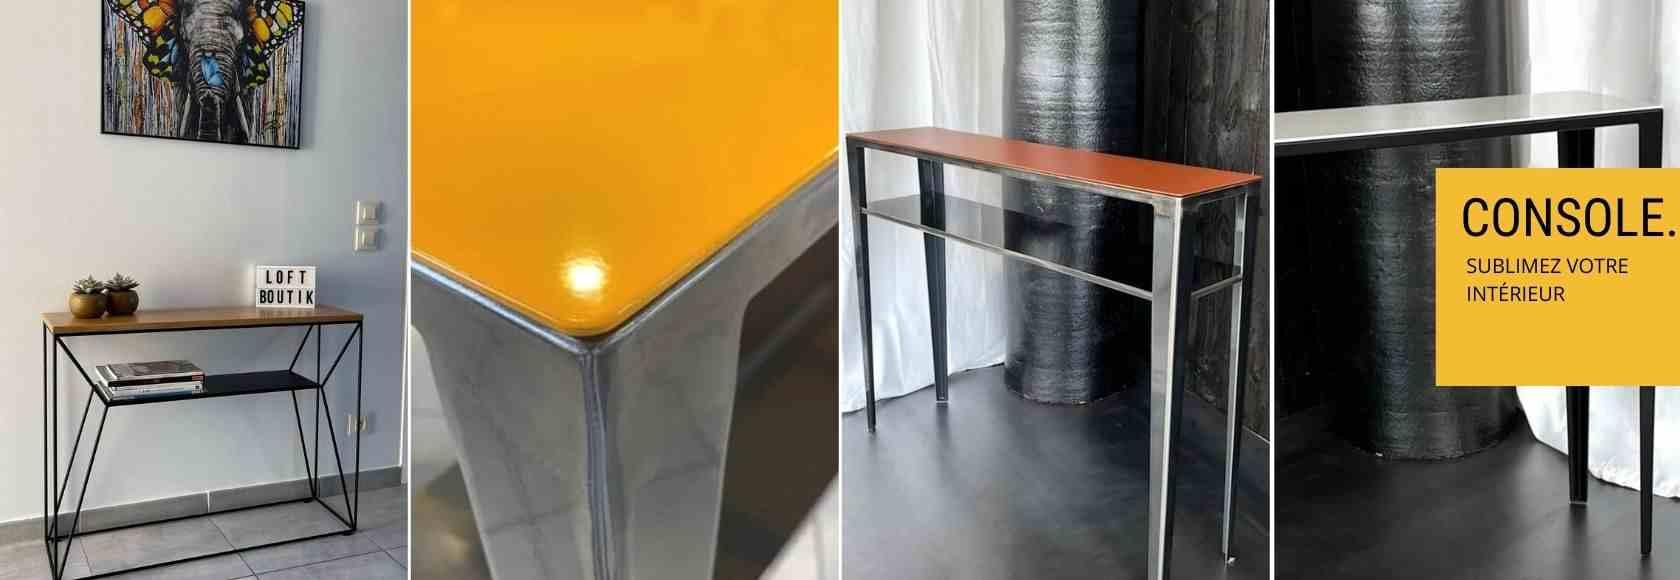 loftboutik meuble console mobilier design table basse design. Black Bedroom Furniture Sets. Home Design Ideas